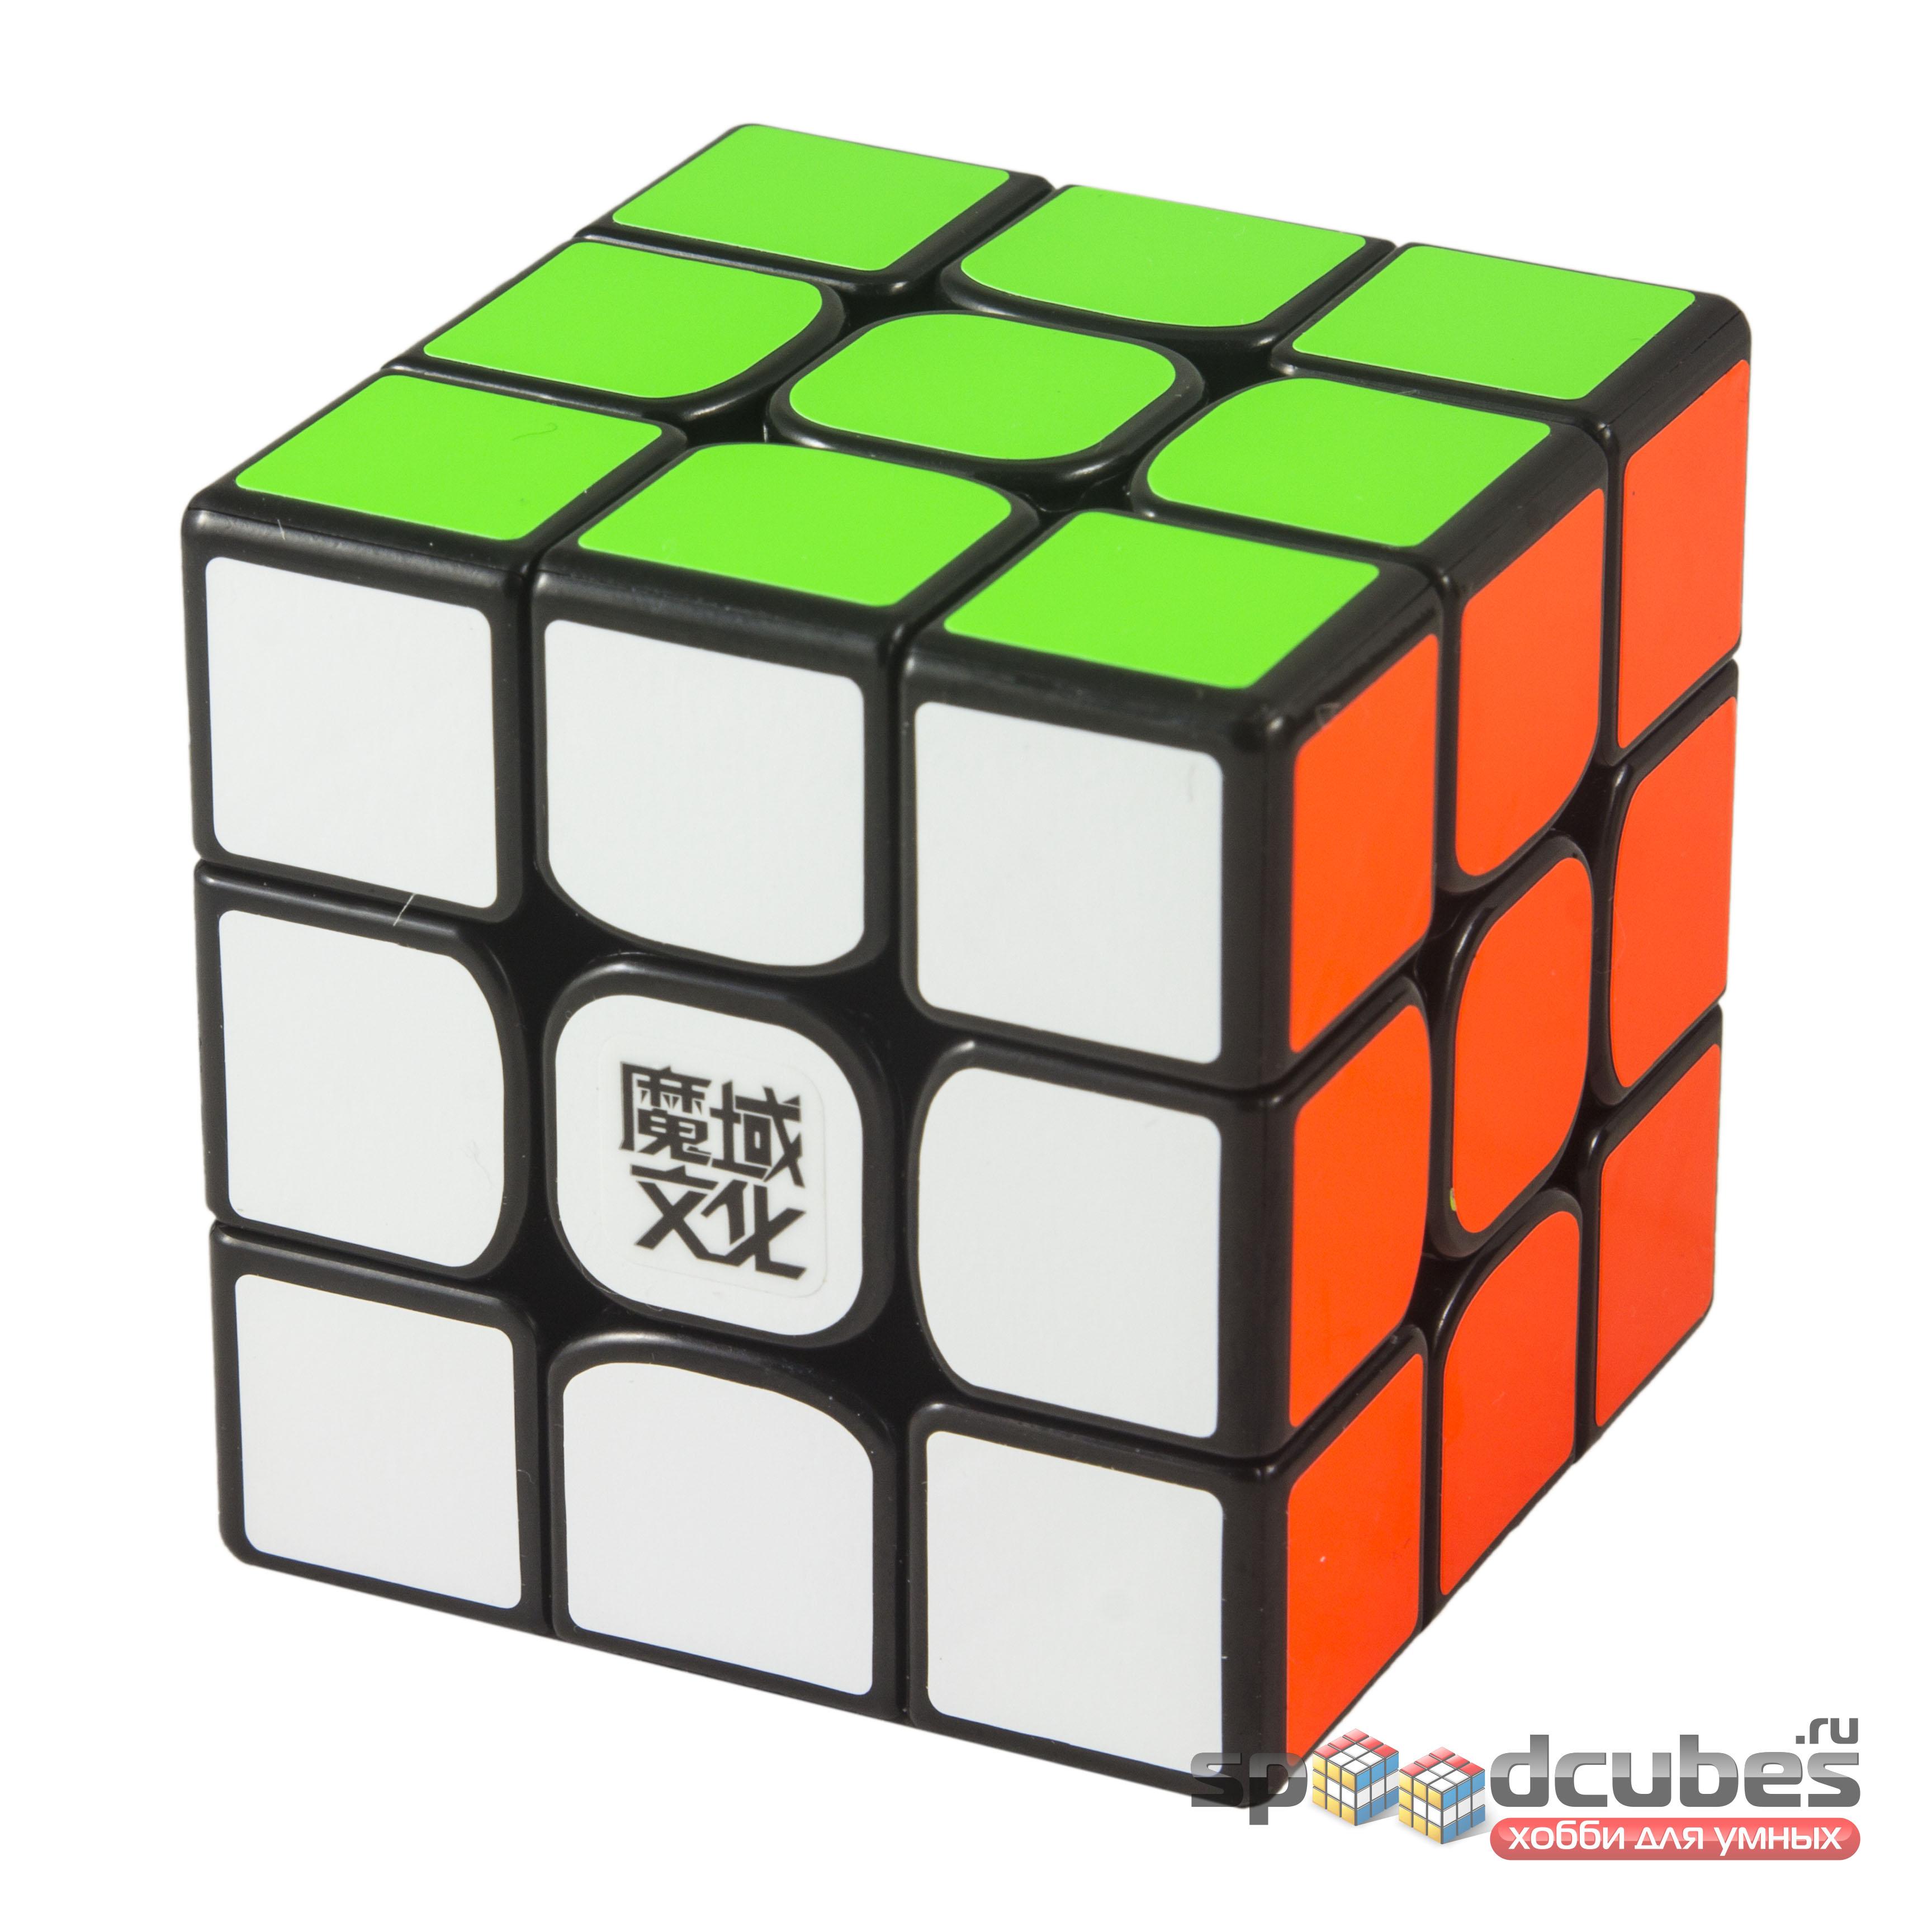 MoYu 3x3x3 Weilong GTS 2